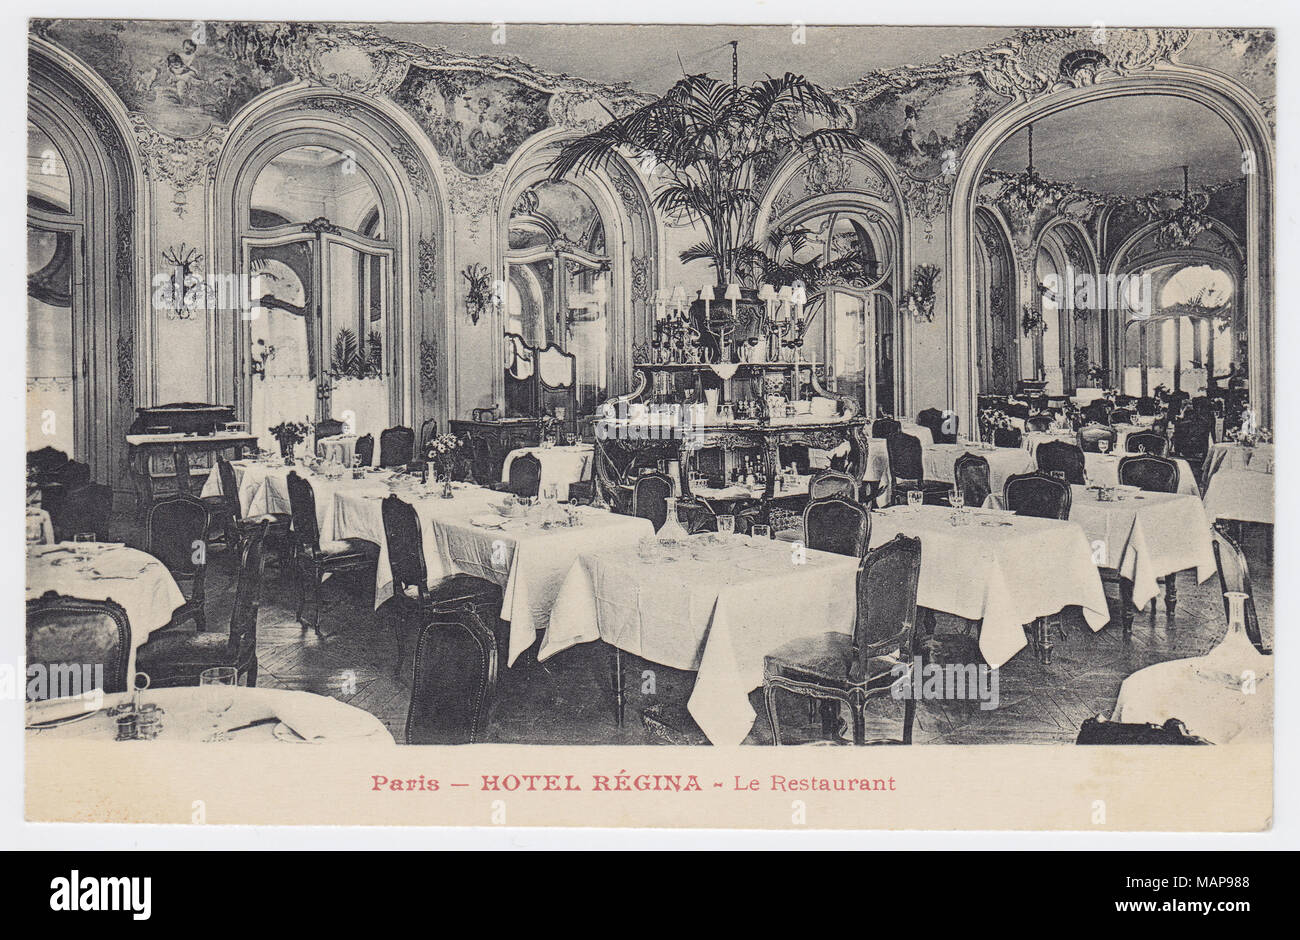 Hôtel Regina, Paris, France, Restaurant - Stock Image